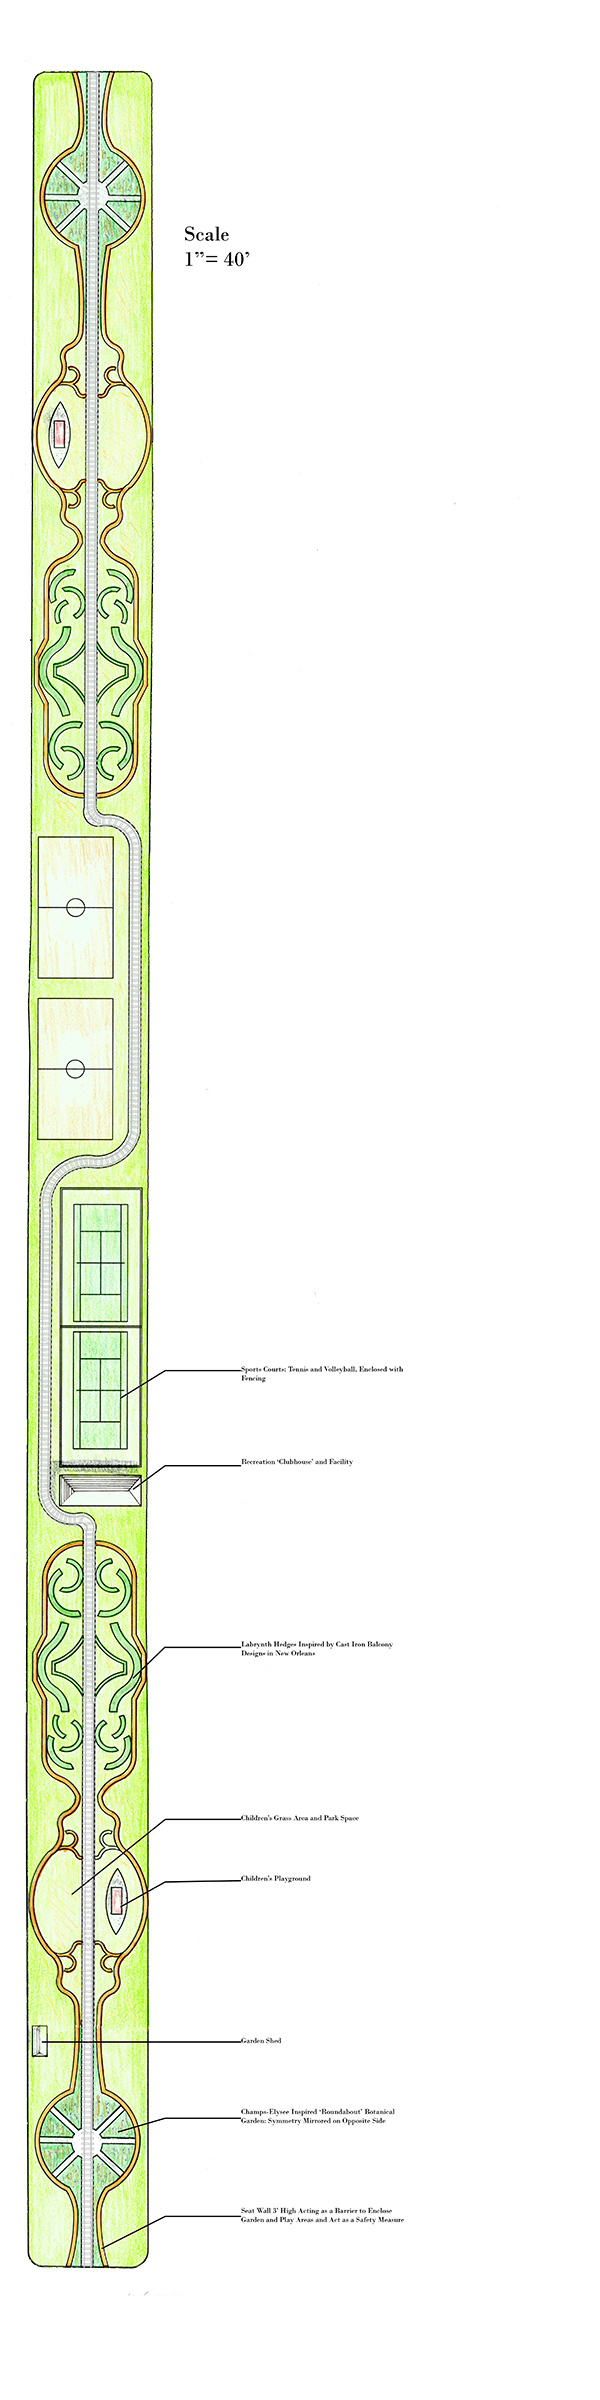 Mid-Gentilly Garden Section Redesign